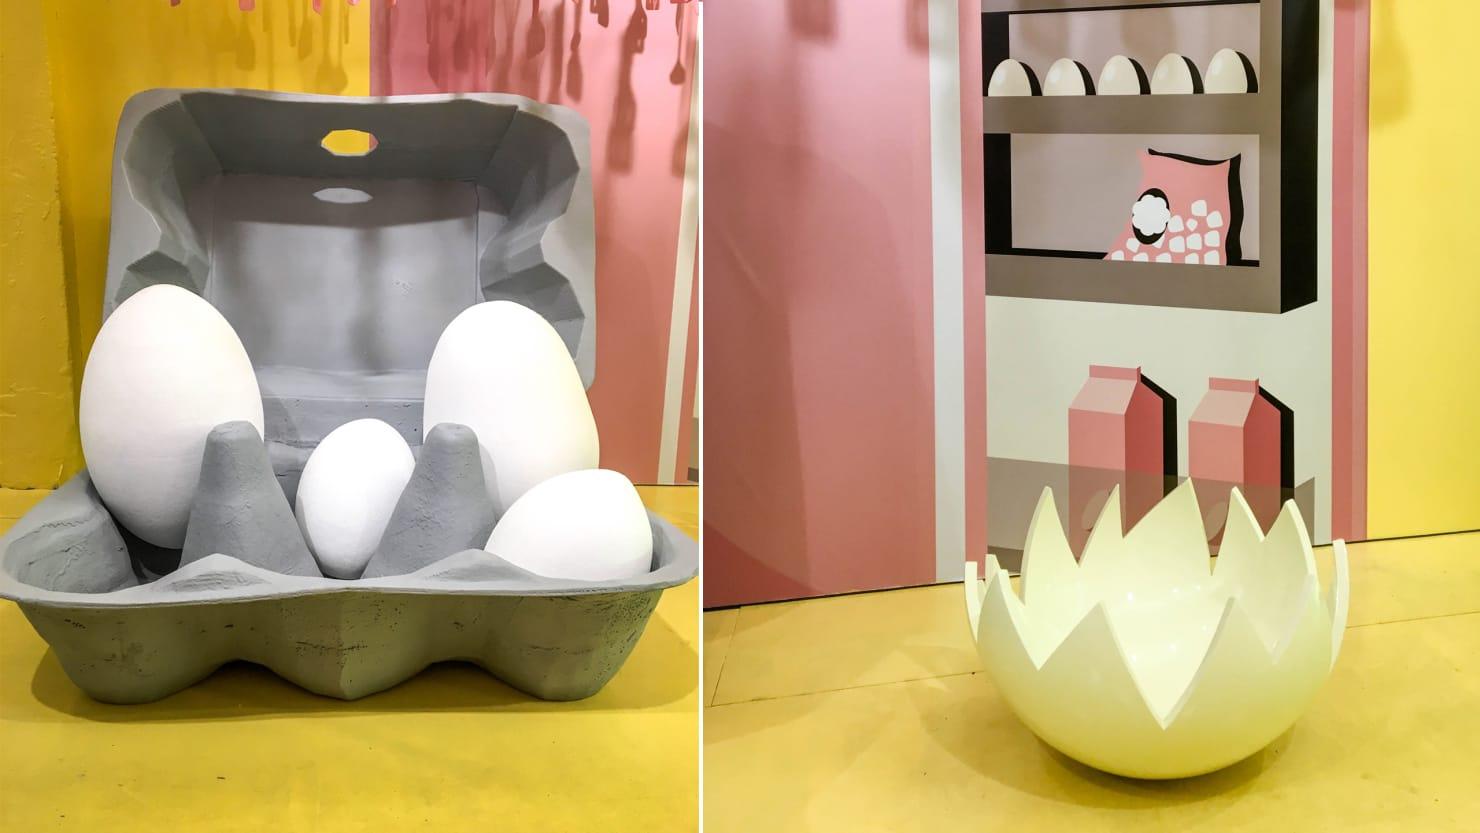 Inside Nyc S Egg House You Ll Meet Ellis An Egg With A Dream